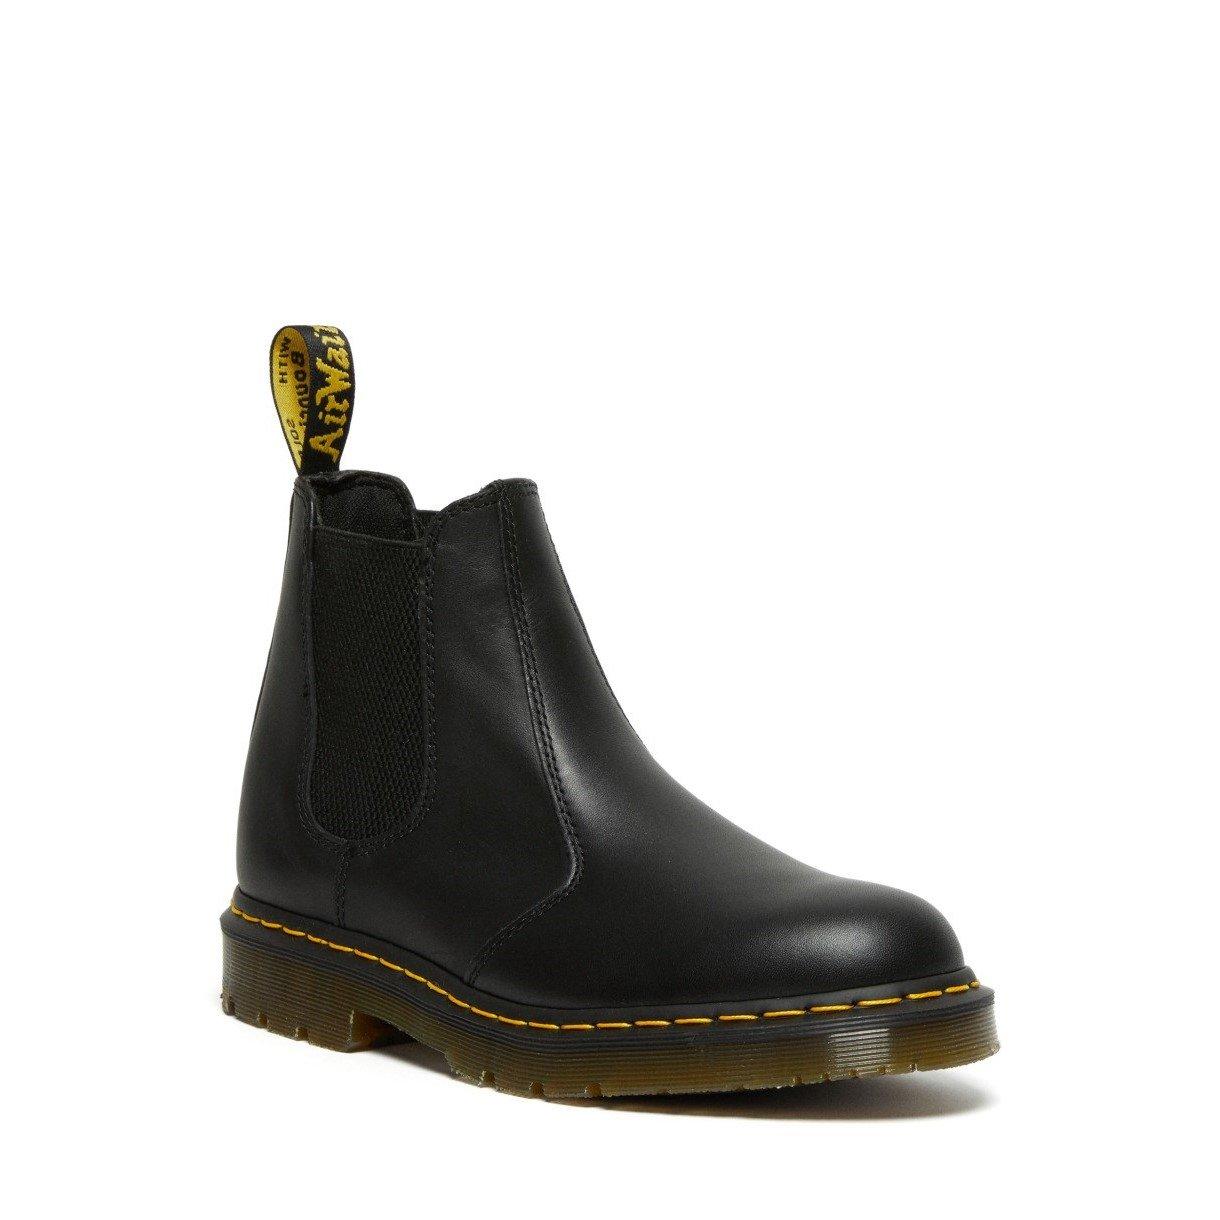 Dr Martens Unisex Slip Resistant Leather Chelsea Boots Black 34023 - Black 3